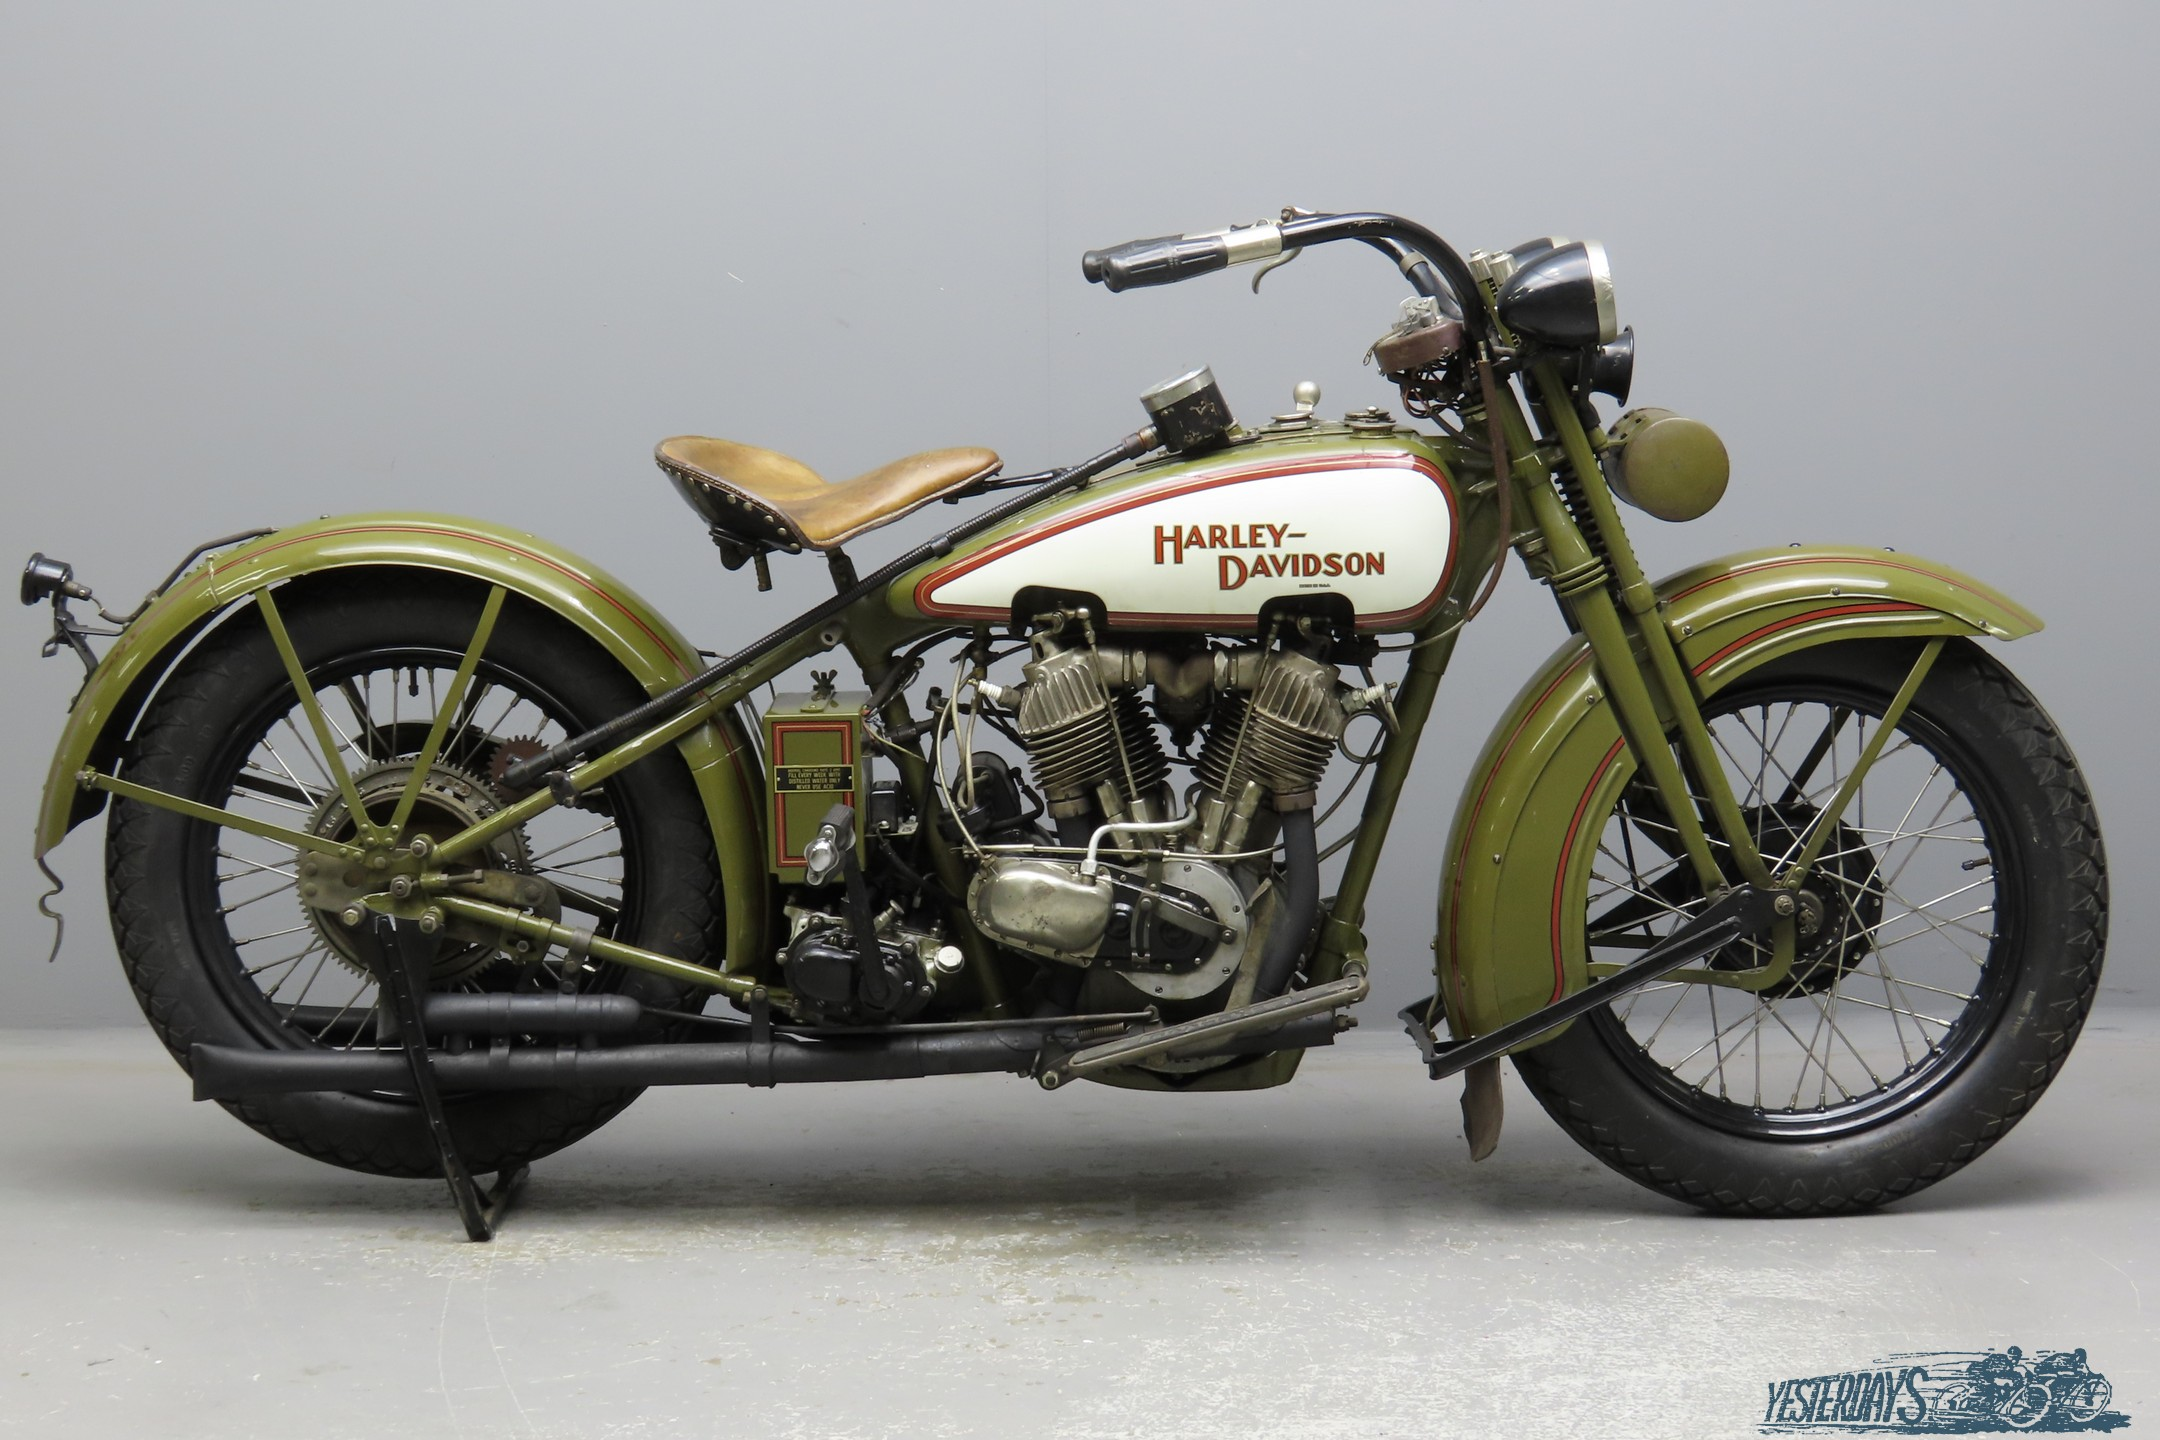 harley davidson 1929 jd 1212cc 2 cyl